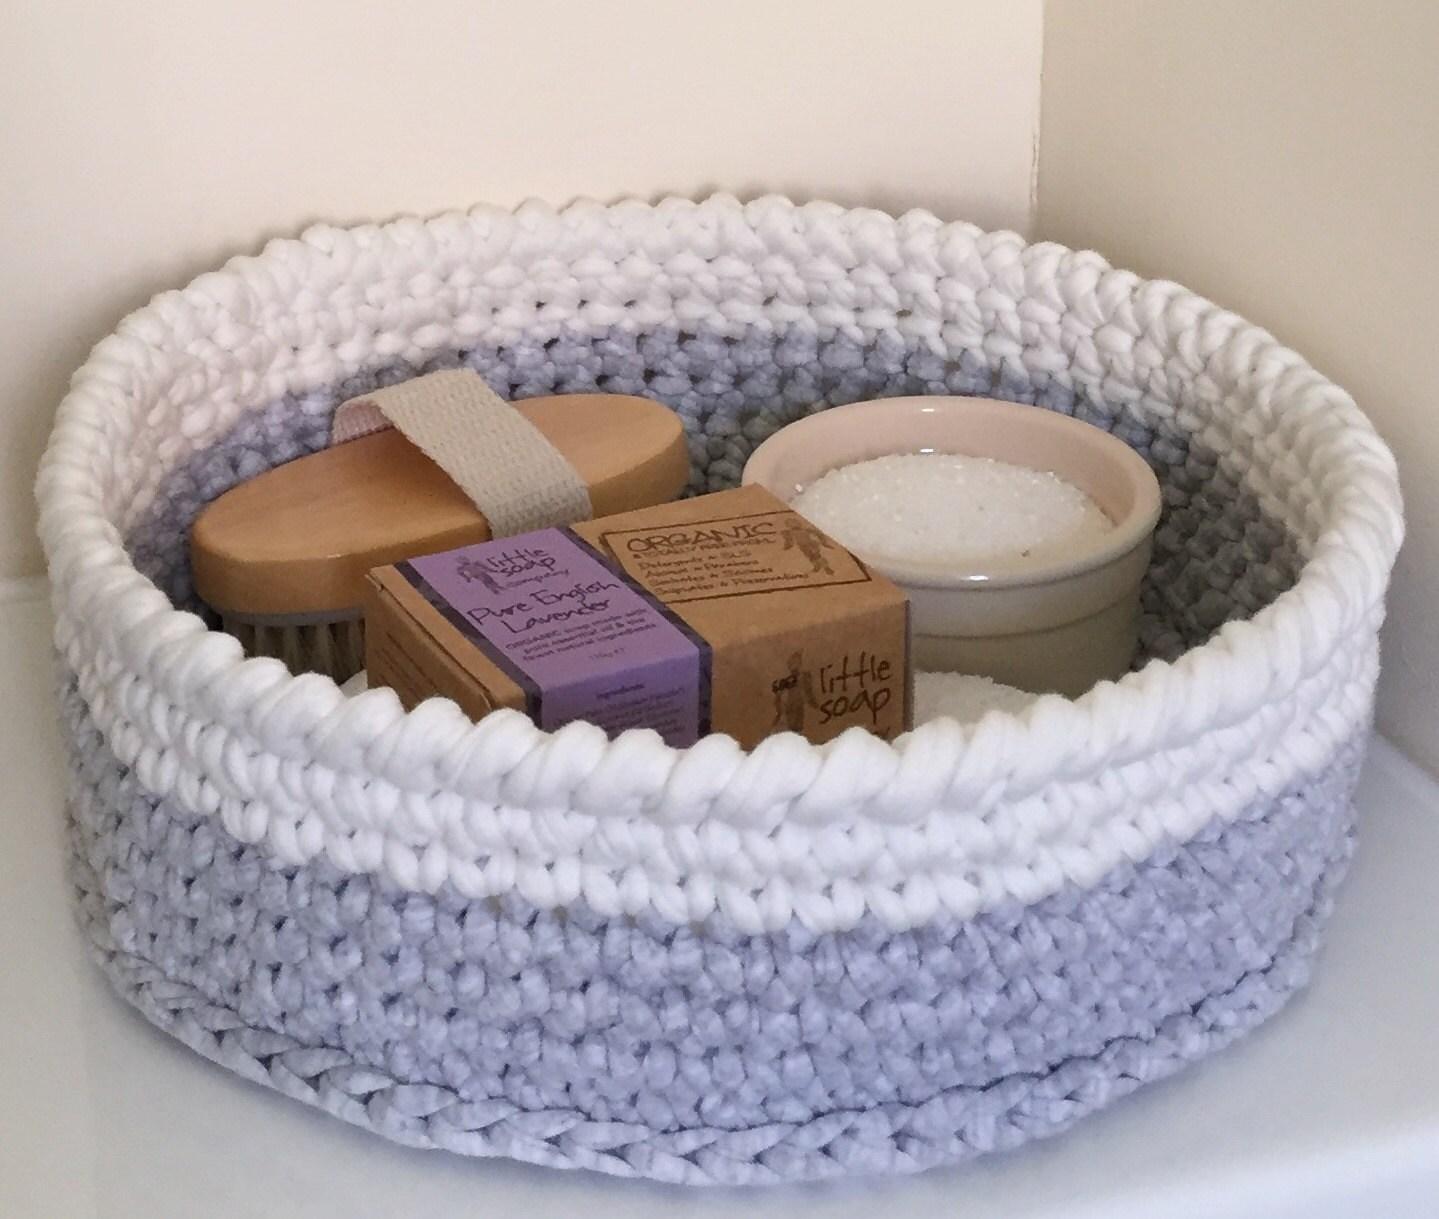 Crochet storage basket  nursery toy bathroom storage bread fruit basket recycled natural yarn